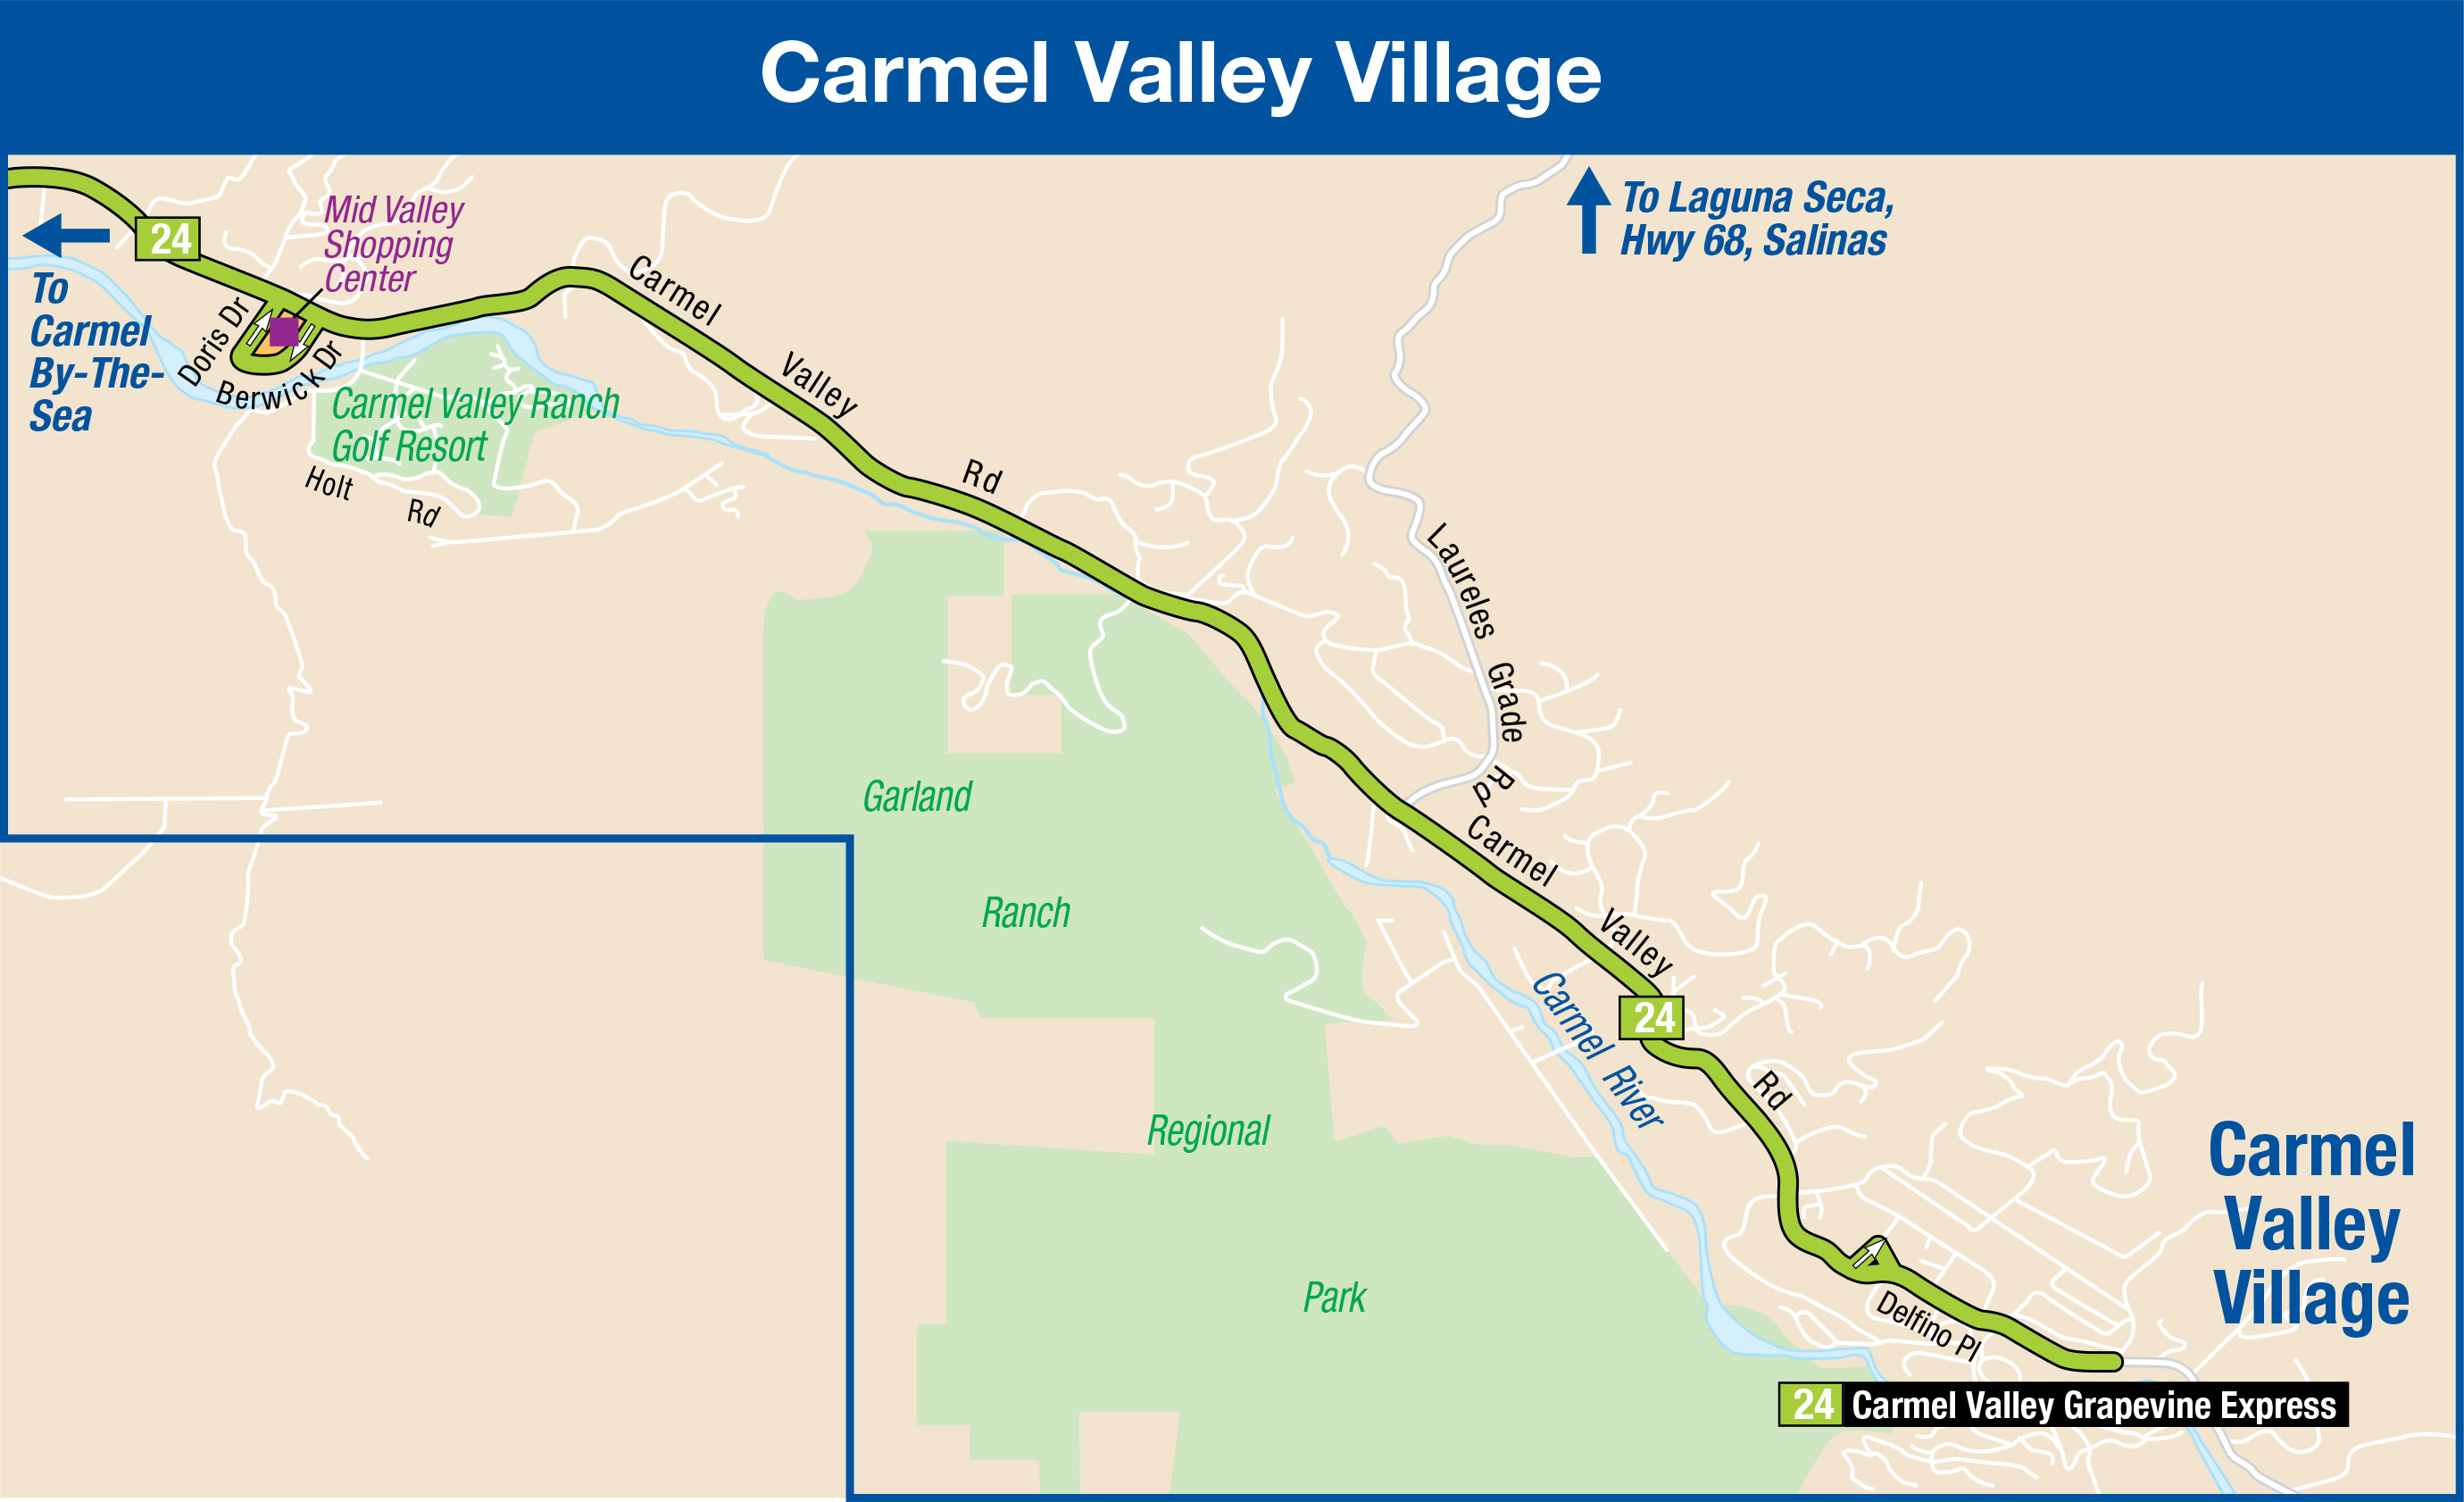 Carmel Valley Village MontereySalinas Transit